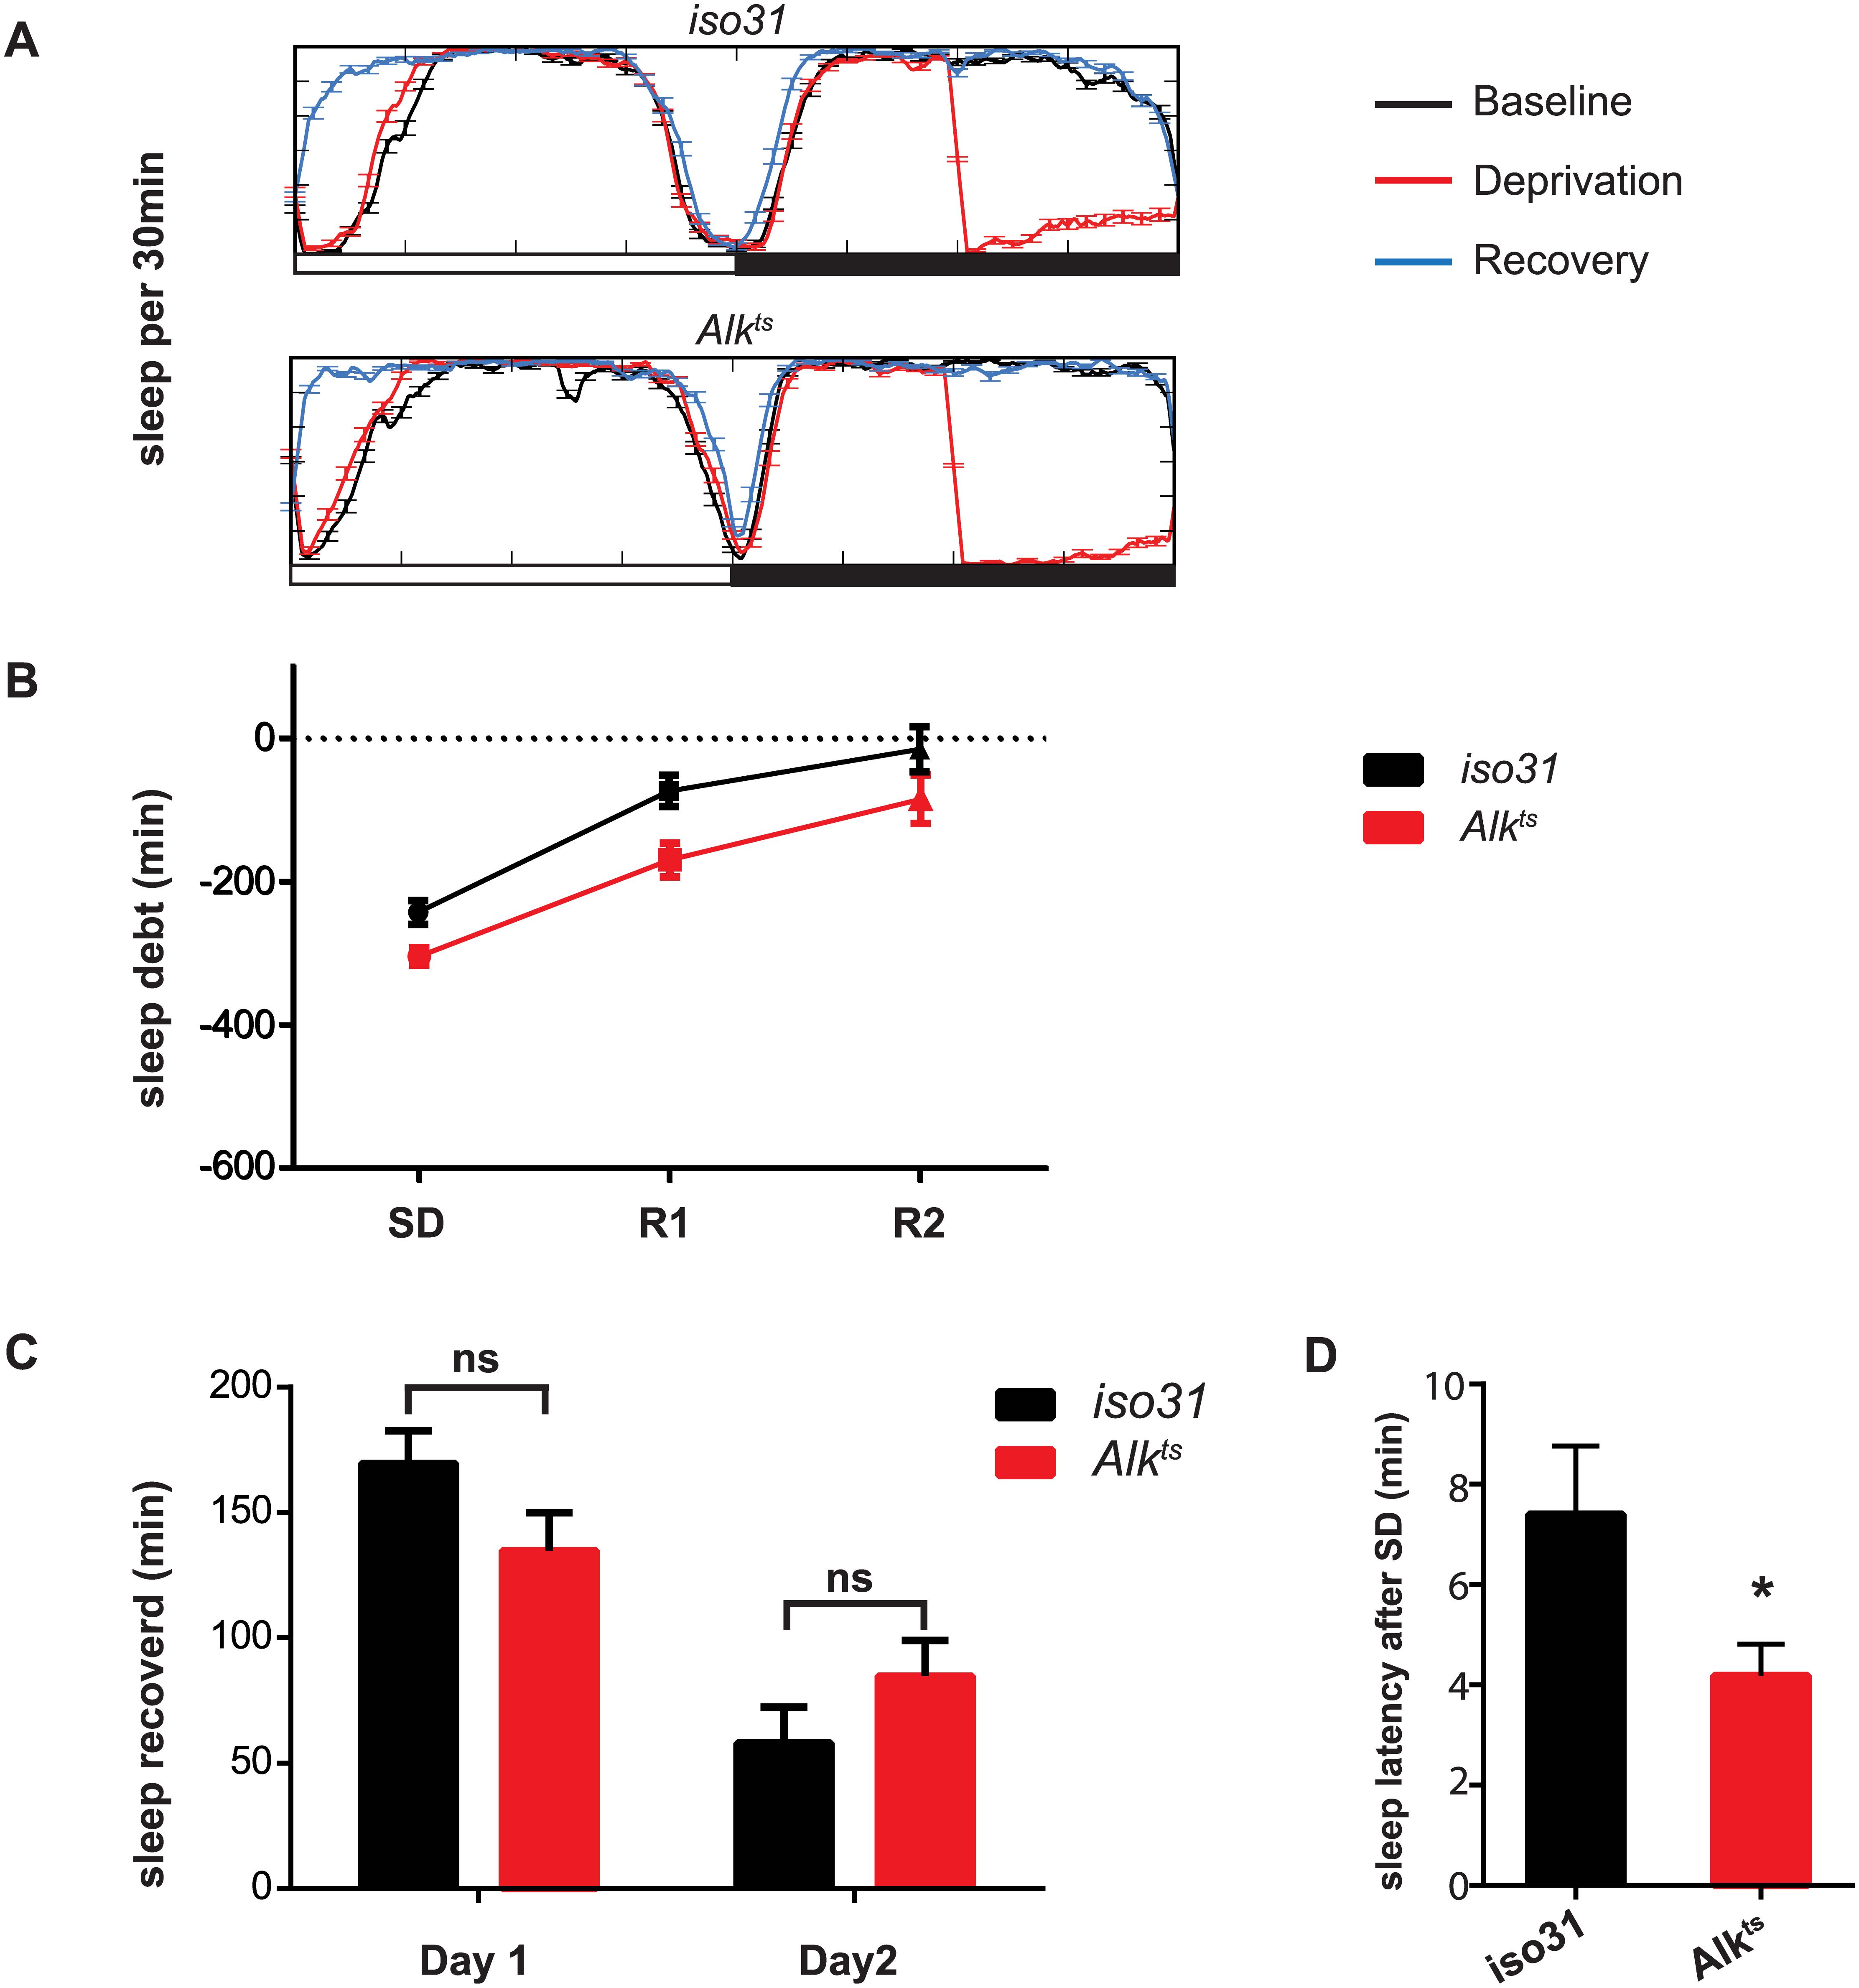 Homeostatic response to sleep loss in <i>Alk</i> mutants.